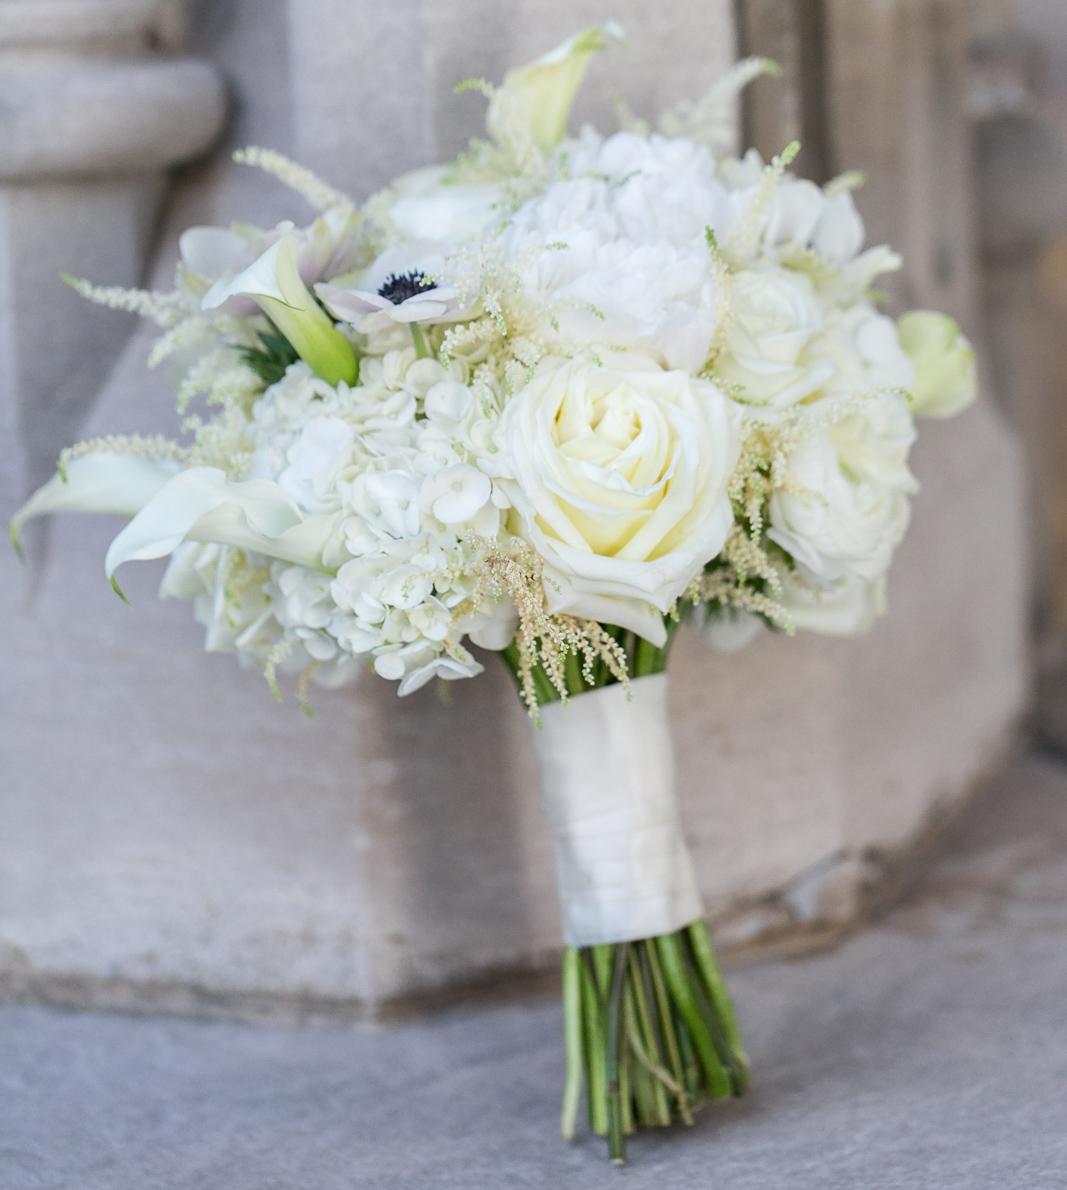 bridal bouquet white roses, ivory hydrangeas, anemones, calla lily